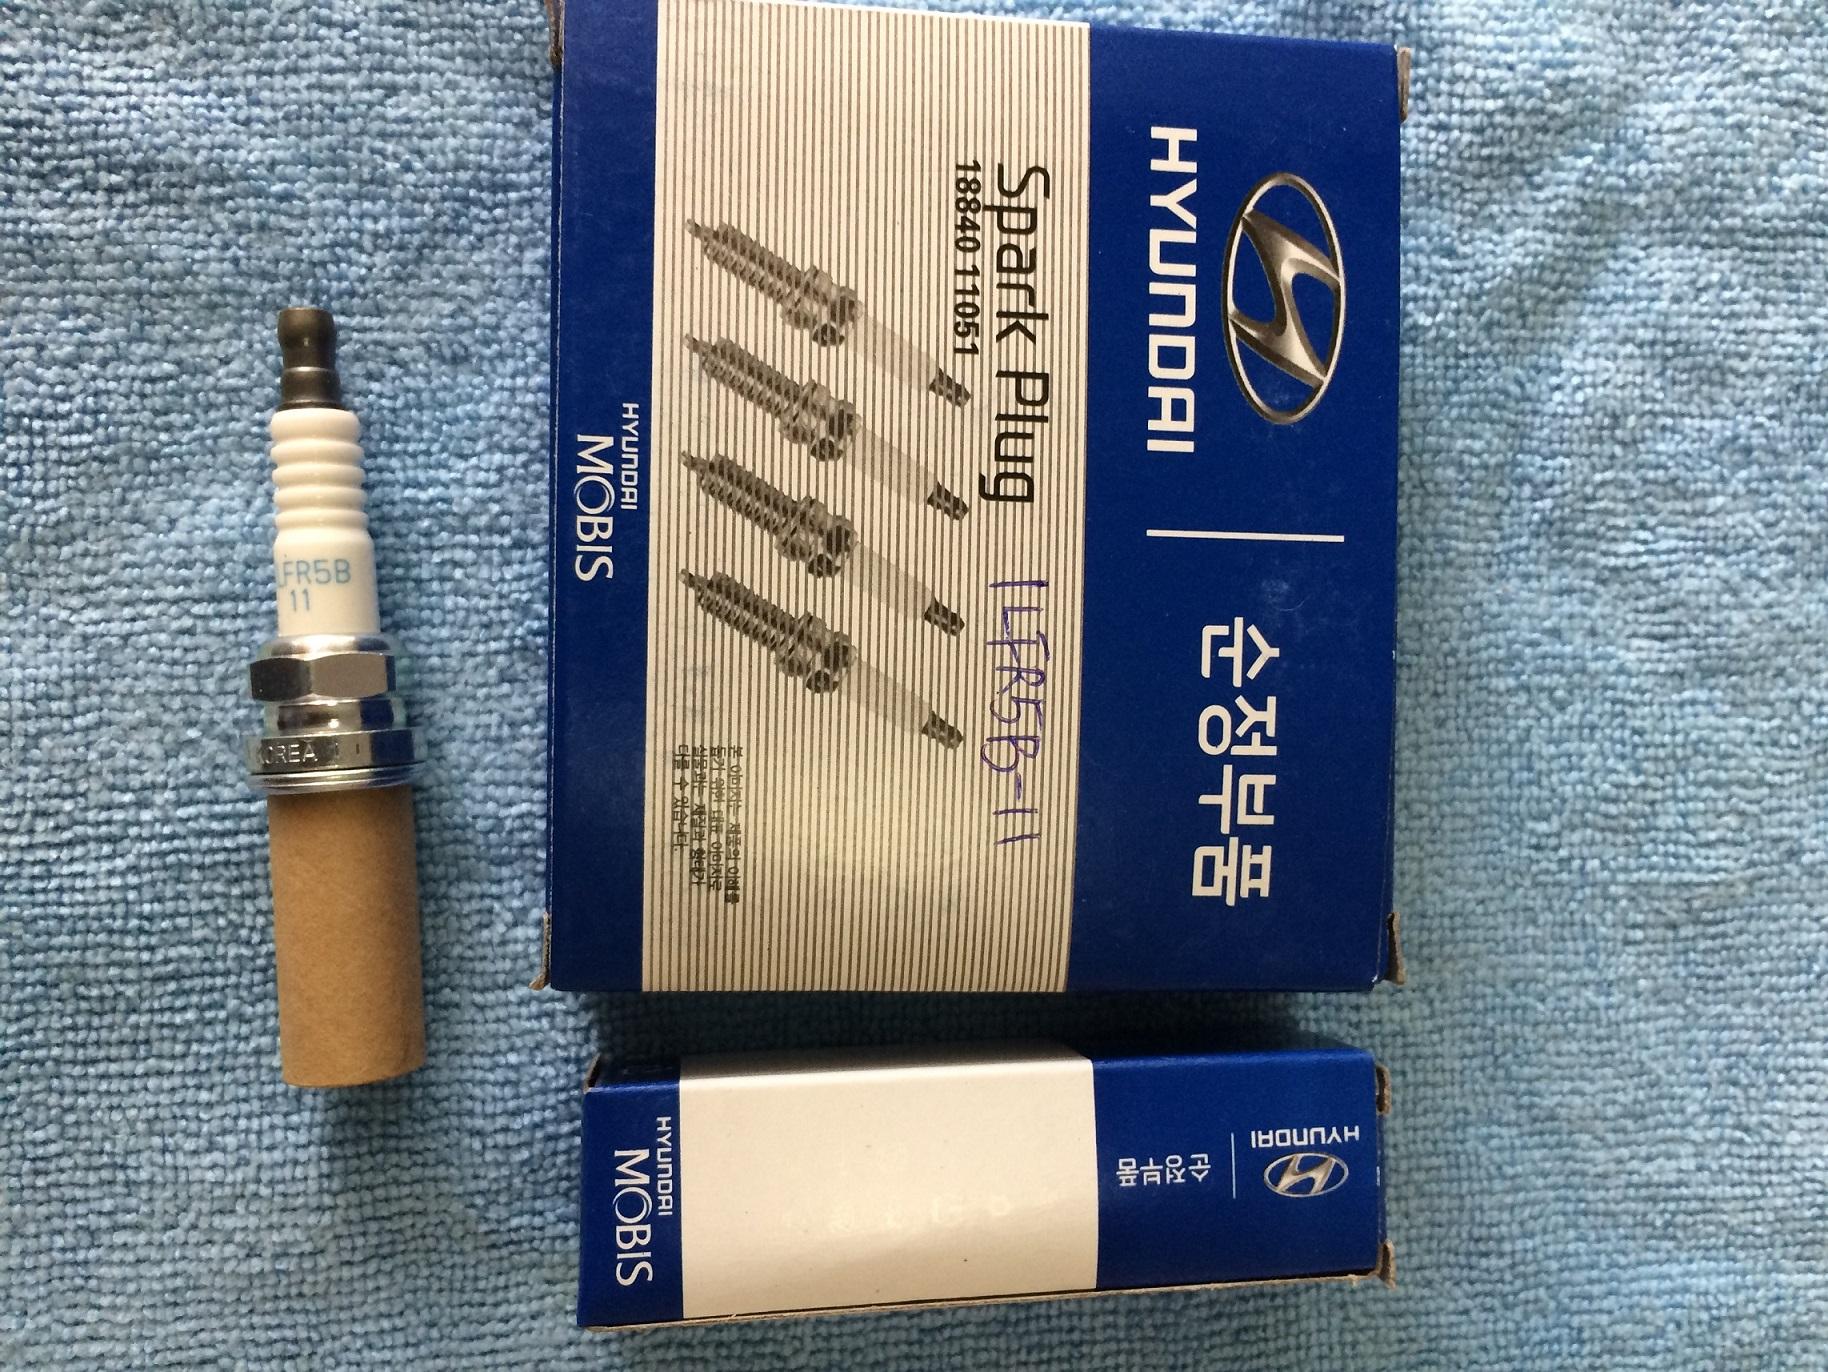 ILFR5B11 Spark Plug for Hyundai Genesis Santa Fe Kia Optima Rondo 18840-11051